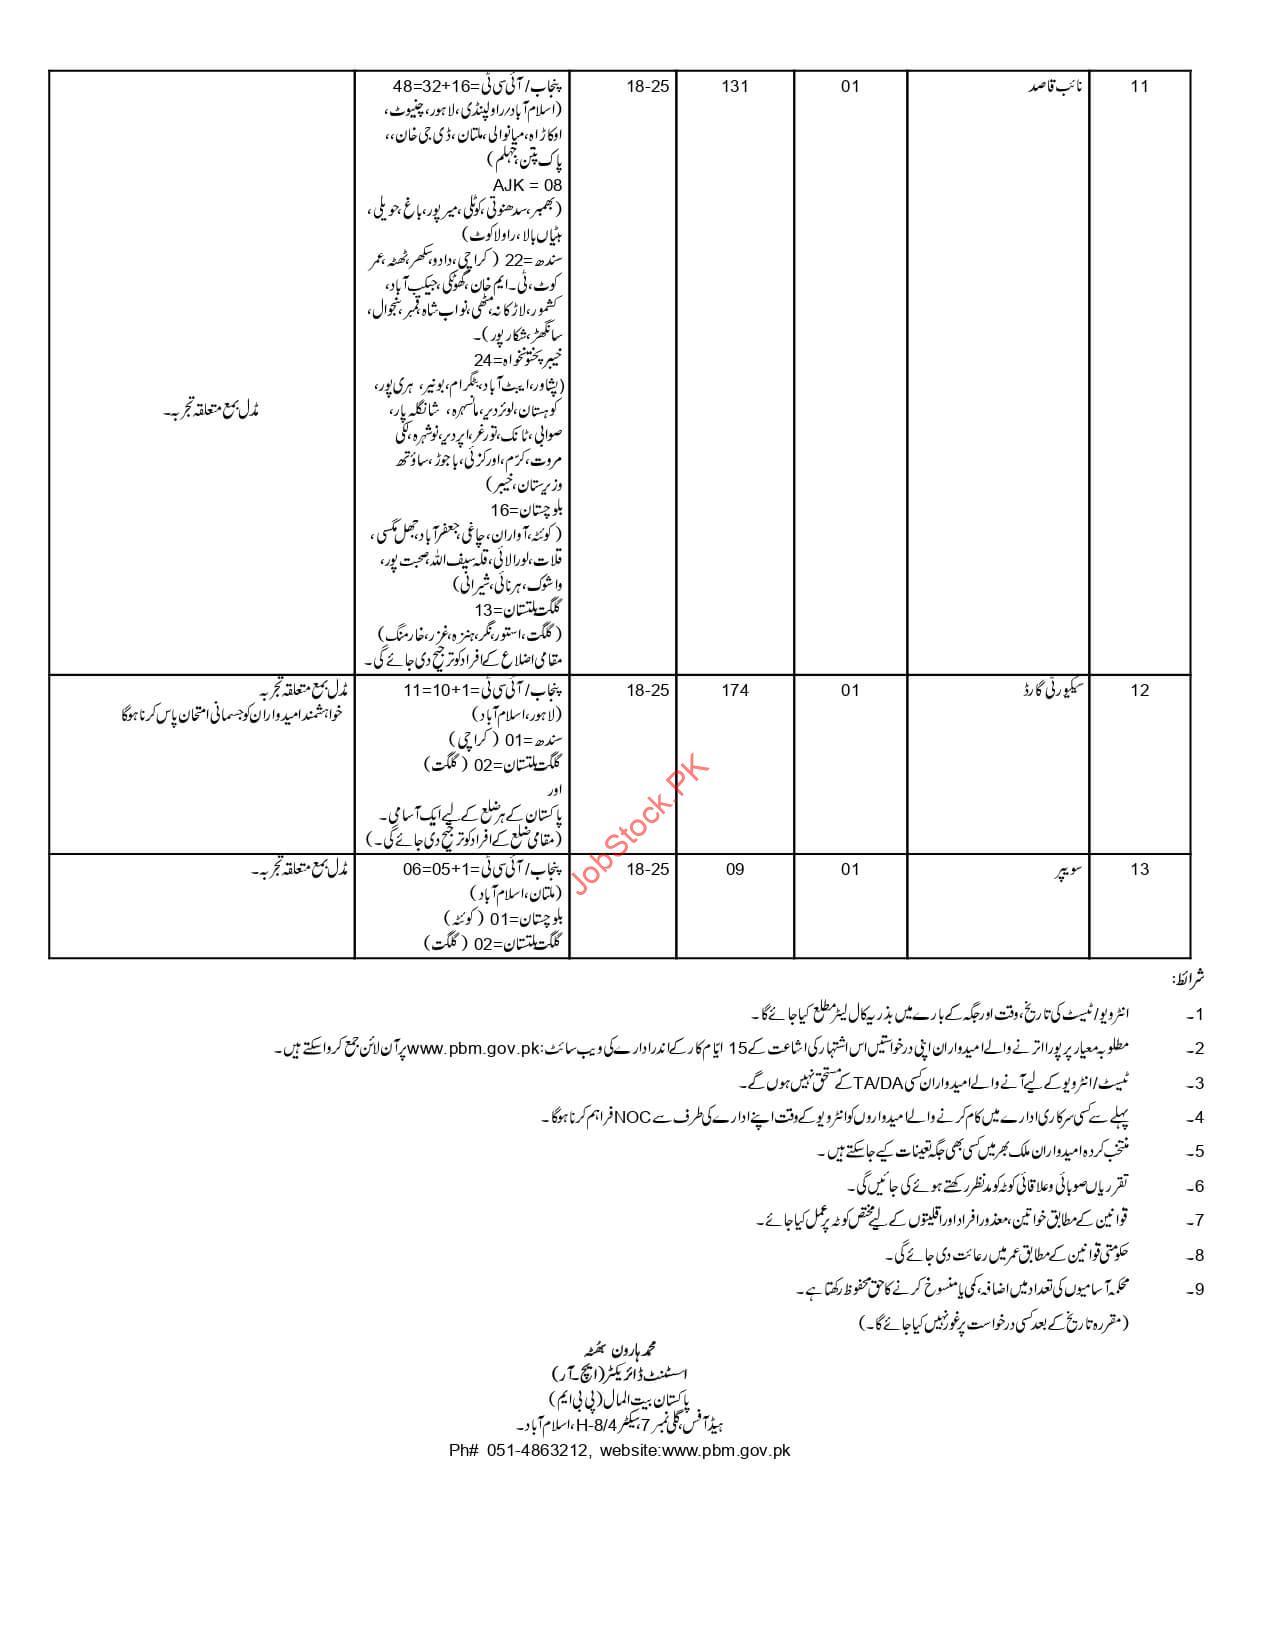 Pbm Jobs Urdu Advertisement Page 2